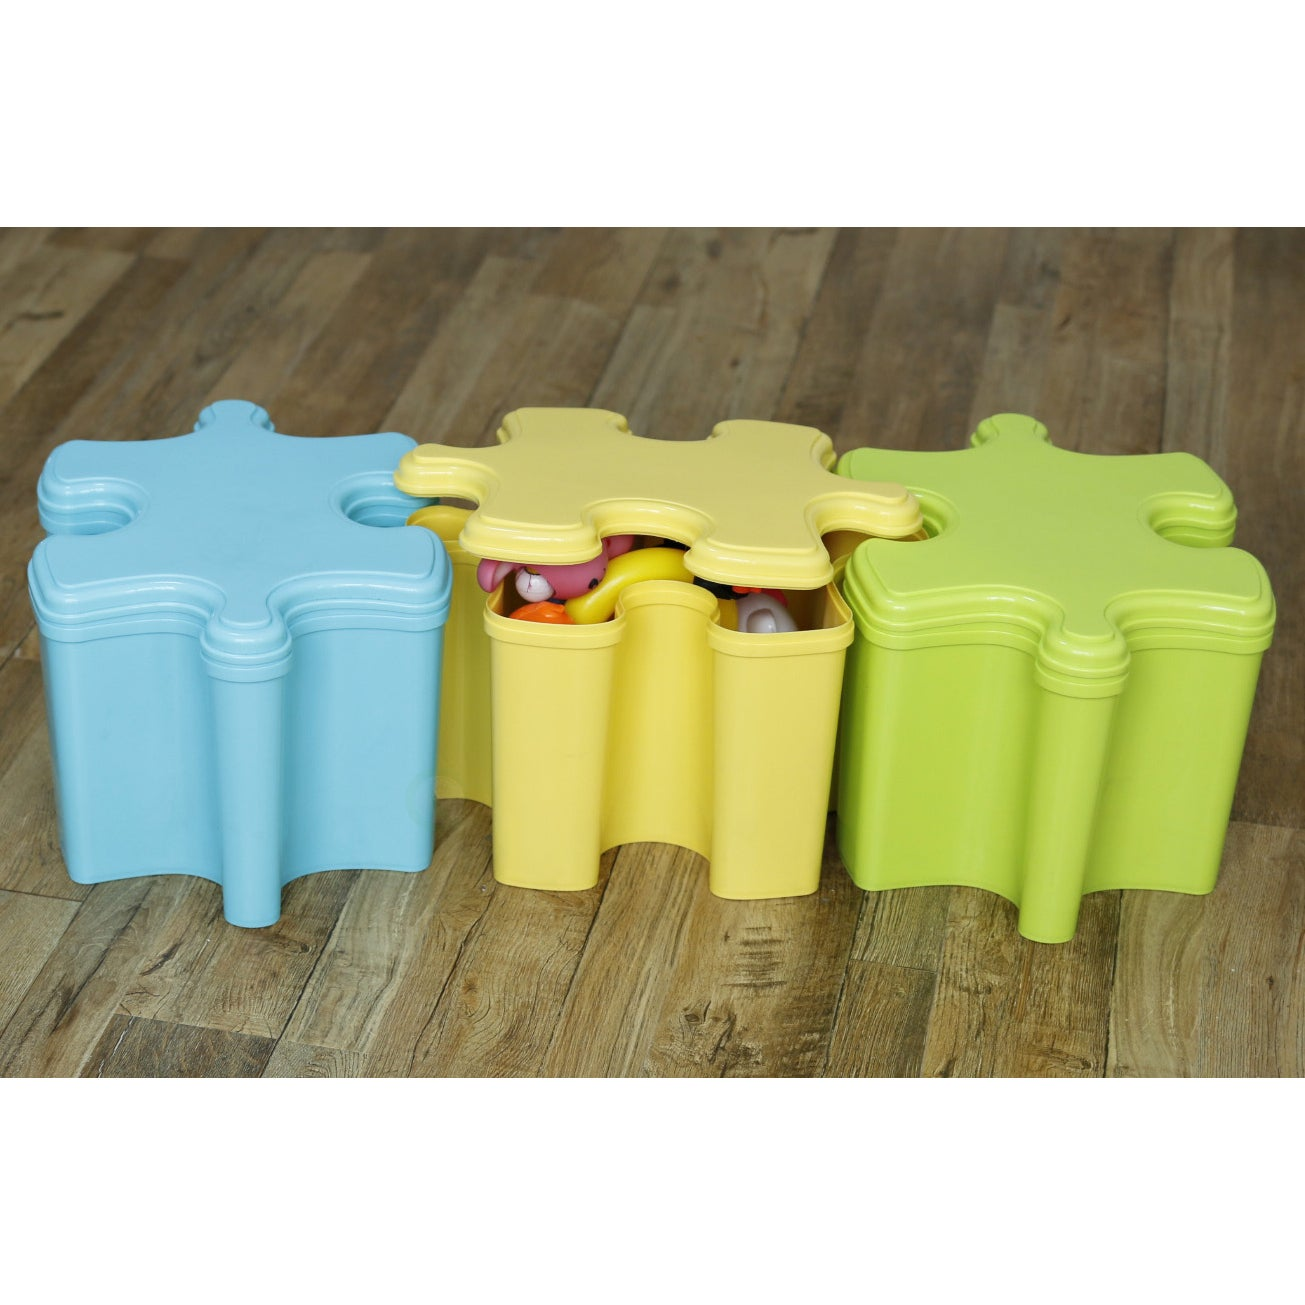 Basicwise Set of Three Puzzle Piece Shaped Toy Storage Co...